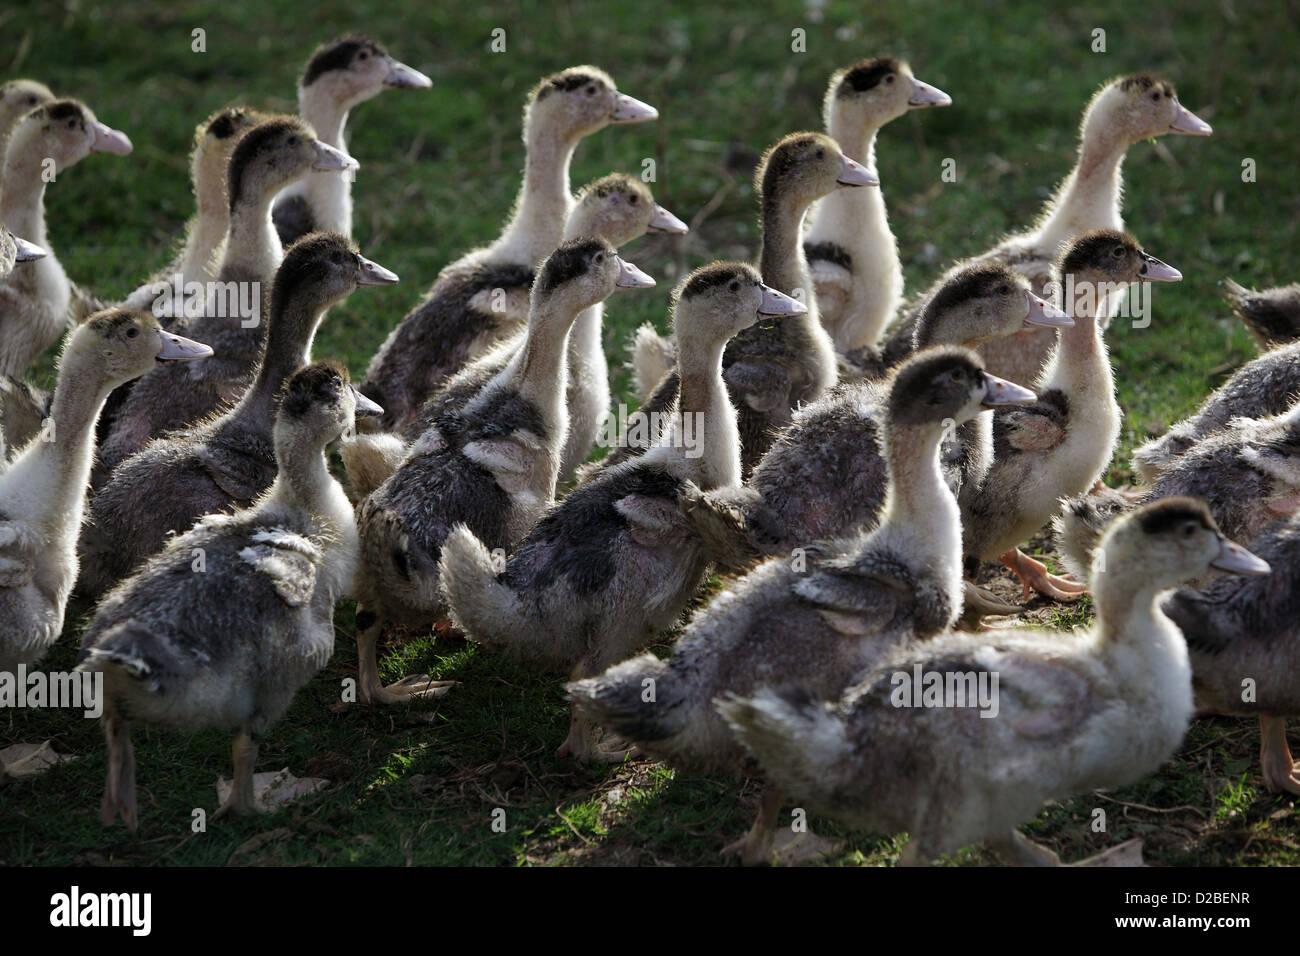 Resplendent village, Germany, Pomerania young ducks - Stock Image